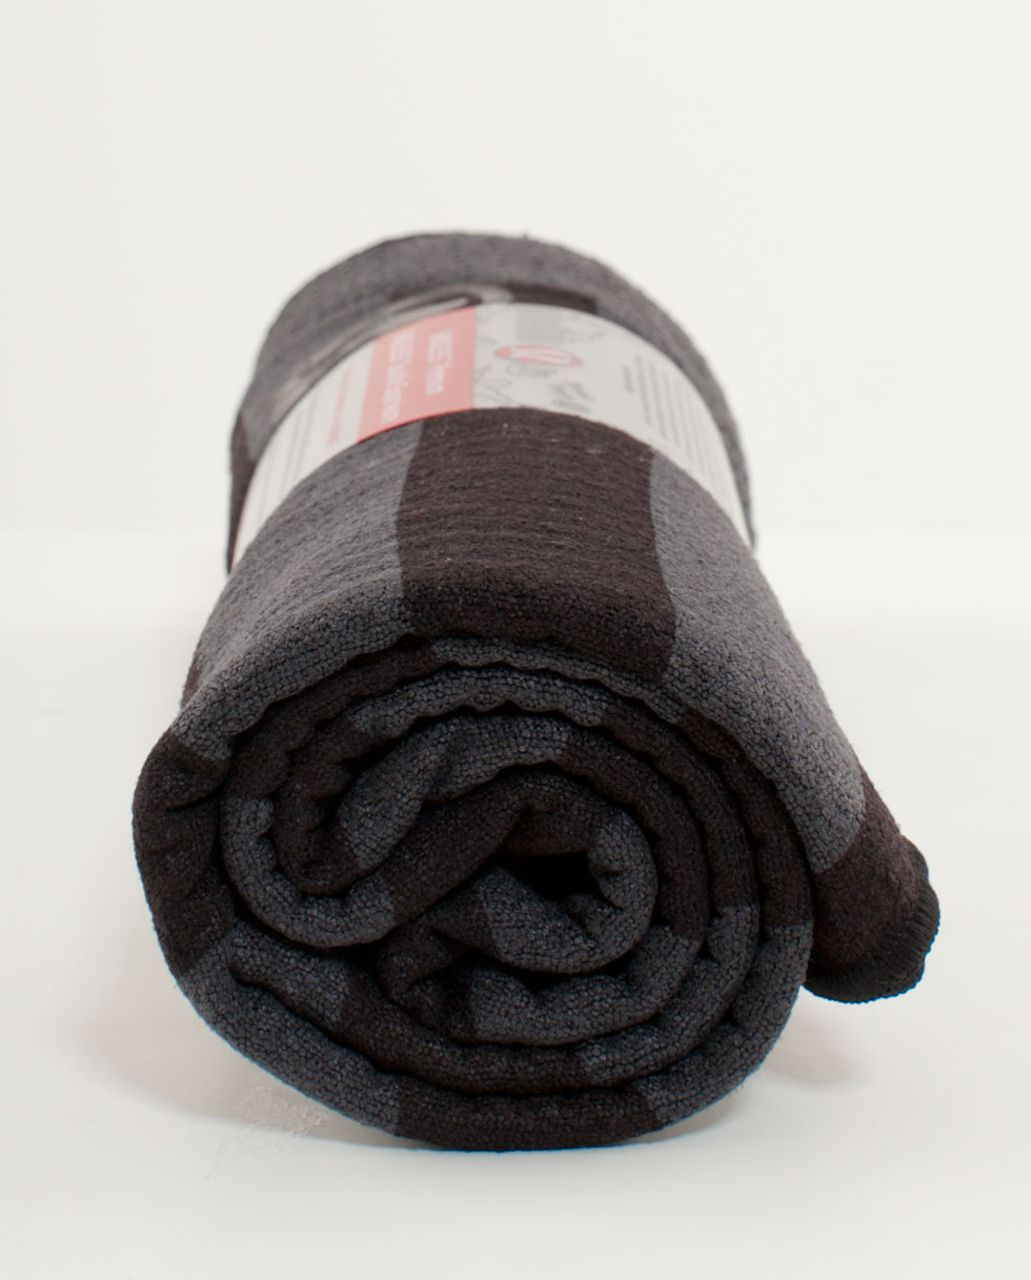 Lululemon Skidless Towel - Deep Coal Coal Wide Tonal Stripe